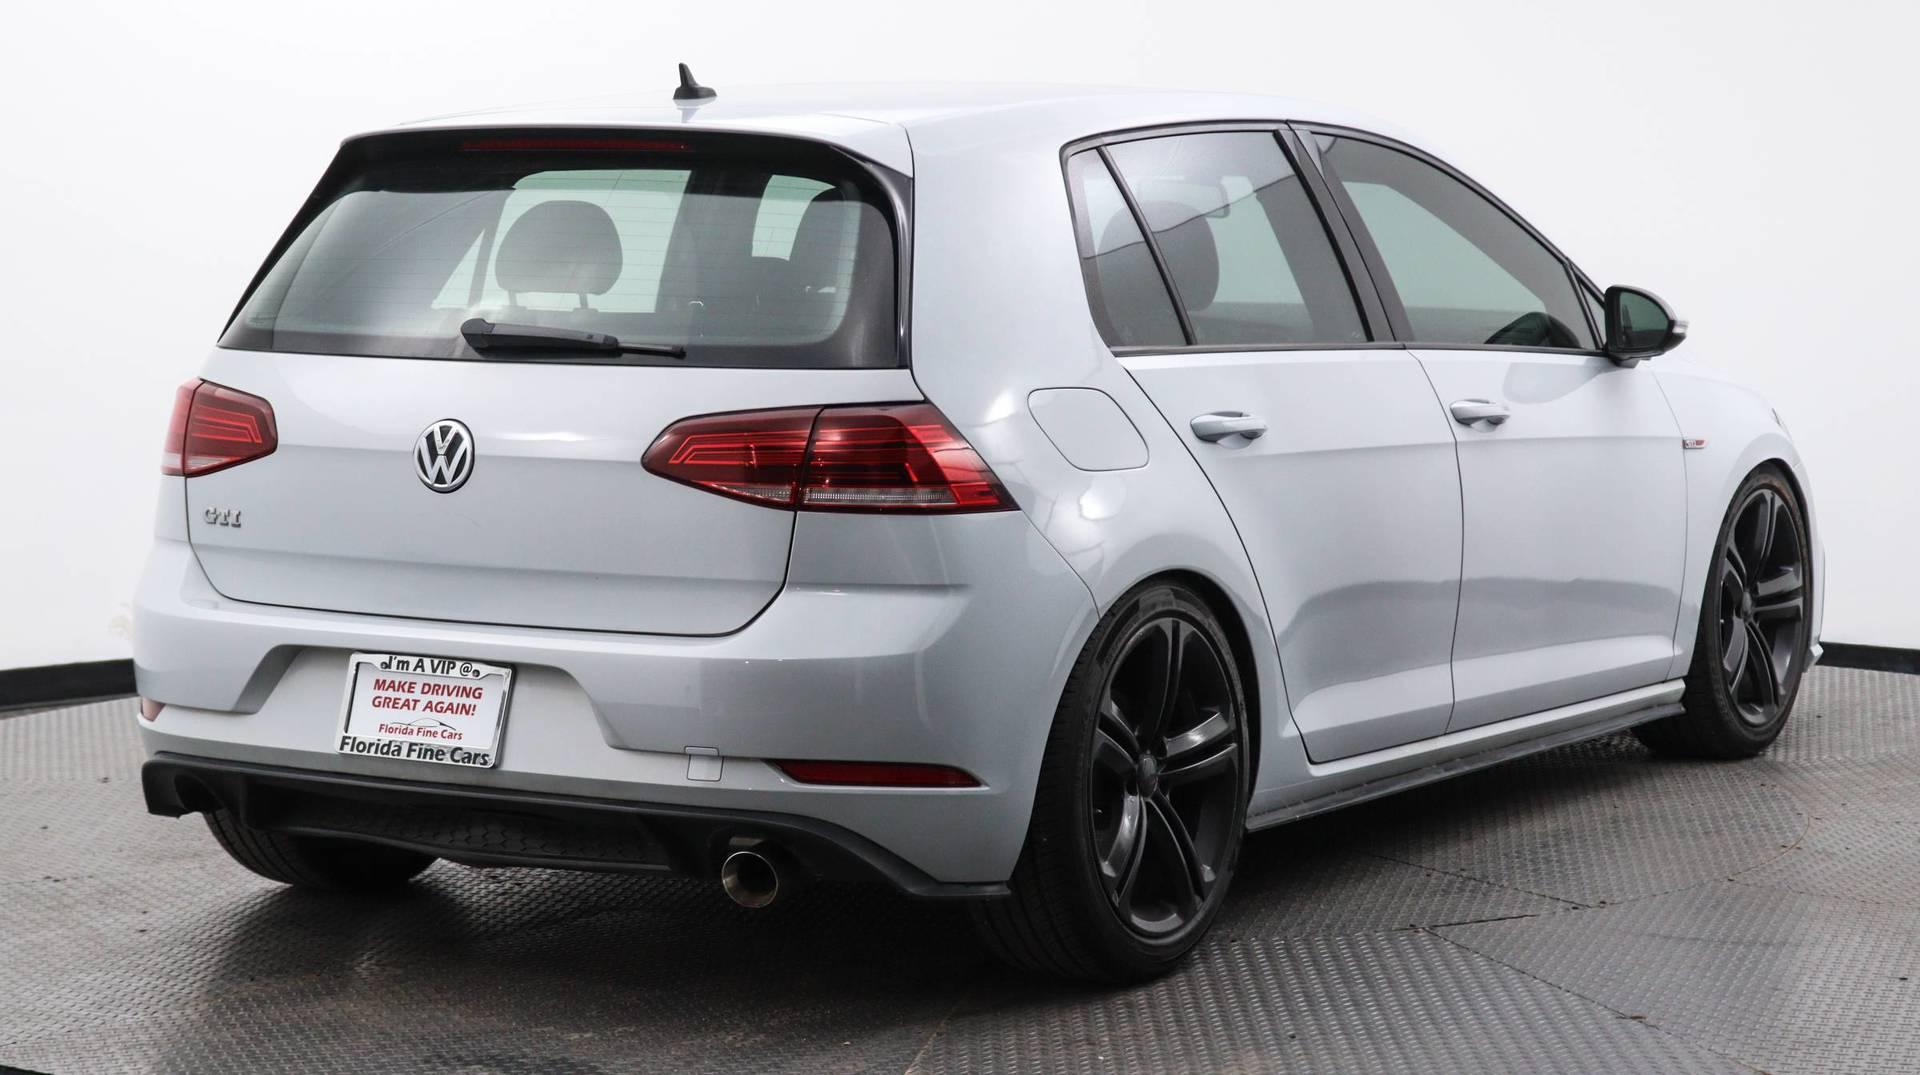 Florida Fine Cars - Used vehicle - Sedan VOLKSWAGEN GOLF GTI 2018